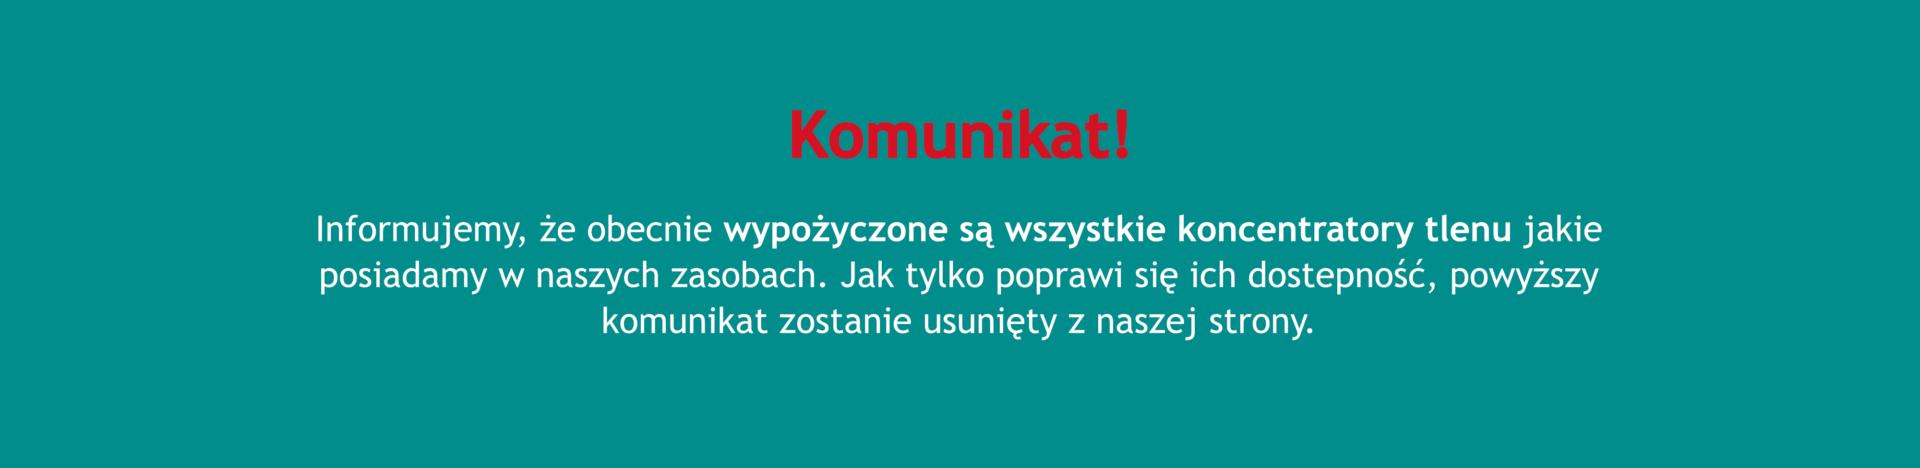 komunikat_koncentratory_tlenu_07